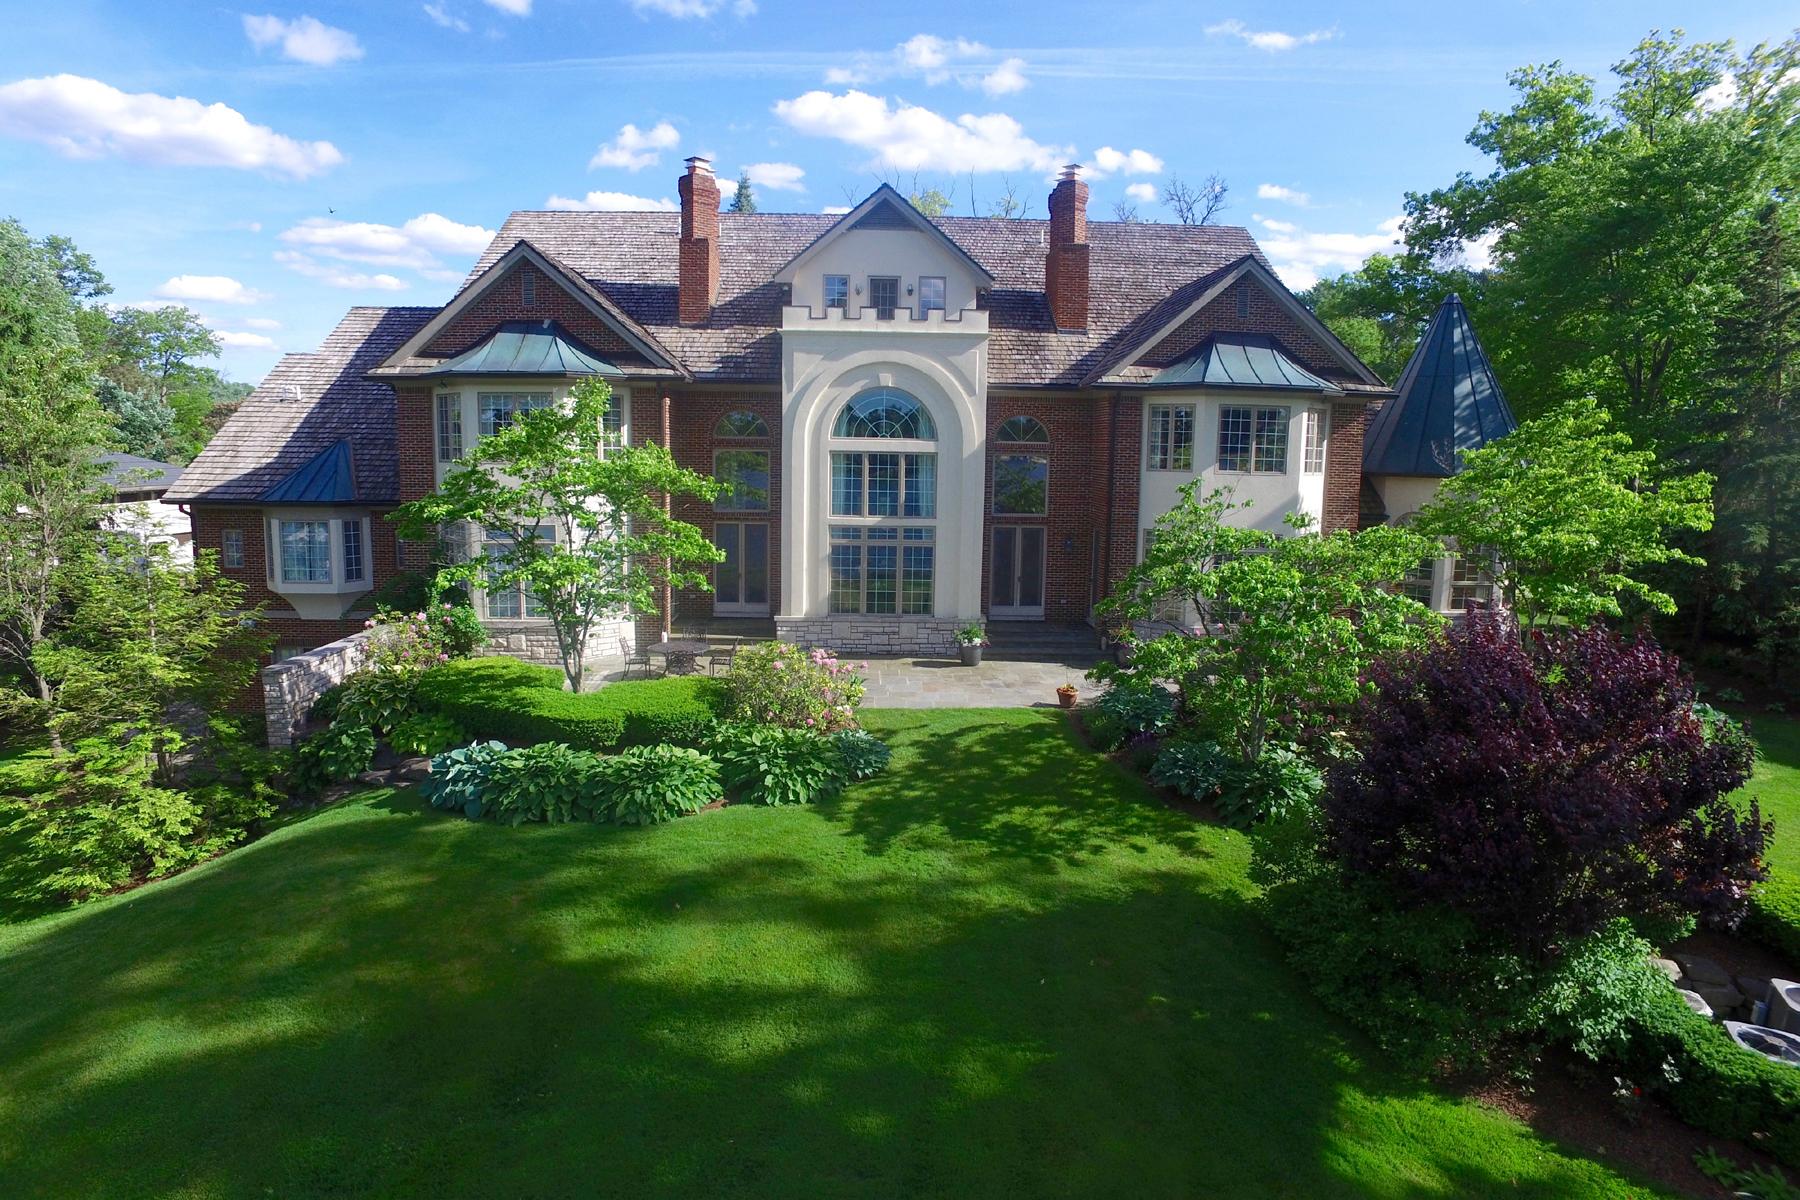 獨棟家庭住宅 為 出售 在 Orchard Lake Orchard Lake, 密歇根州, 48324 美國